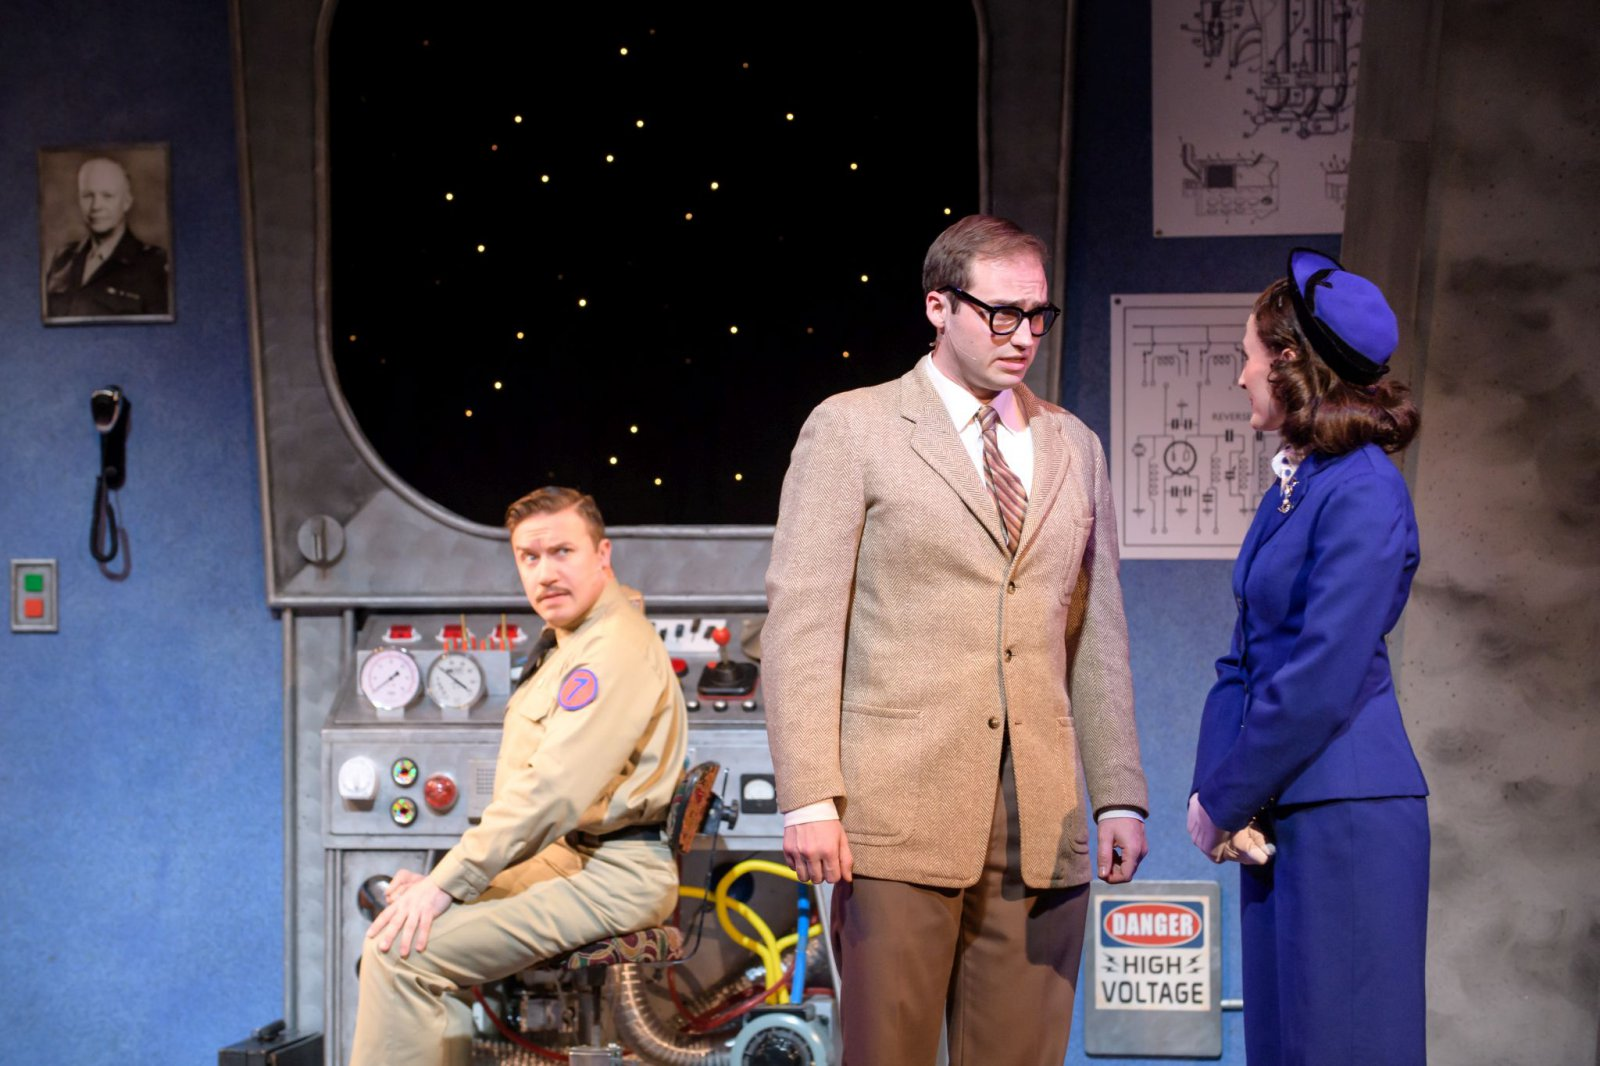 Rick Pendzich (Rick Jones), Matt Frye (Trenton Corbett) and Kathryn Hausman (Mary Malone) in rehearsal for Skylight Music Theatre's Zombies from The Beyond running Feb. 2-18.